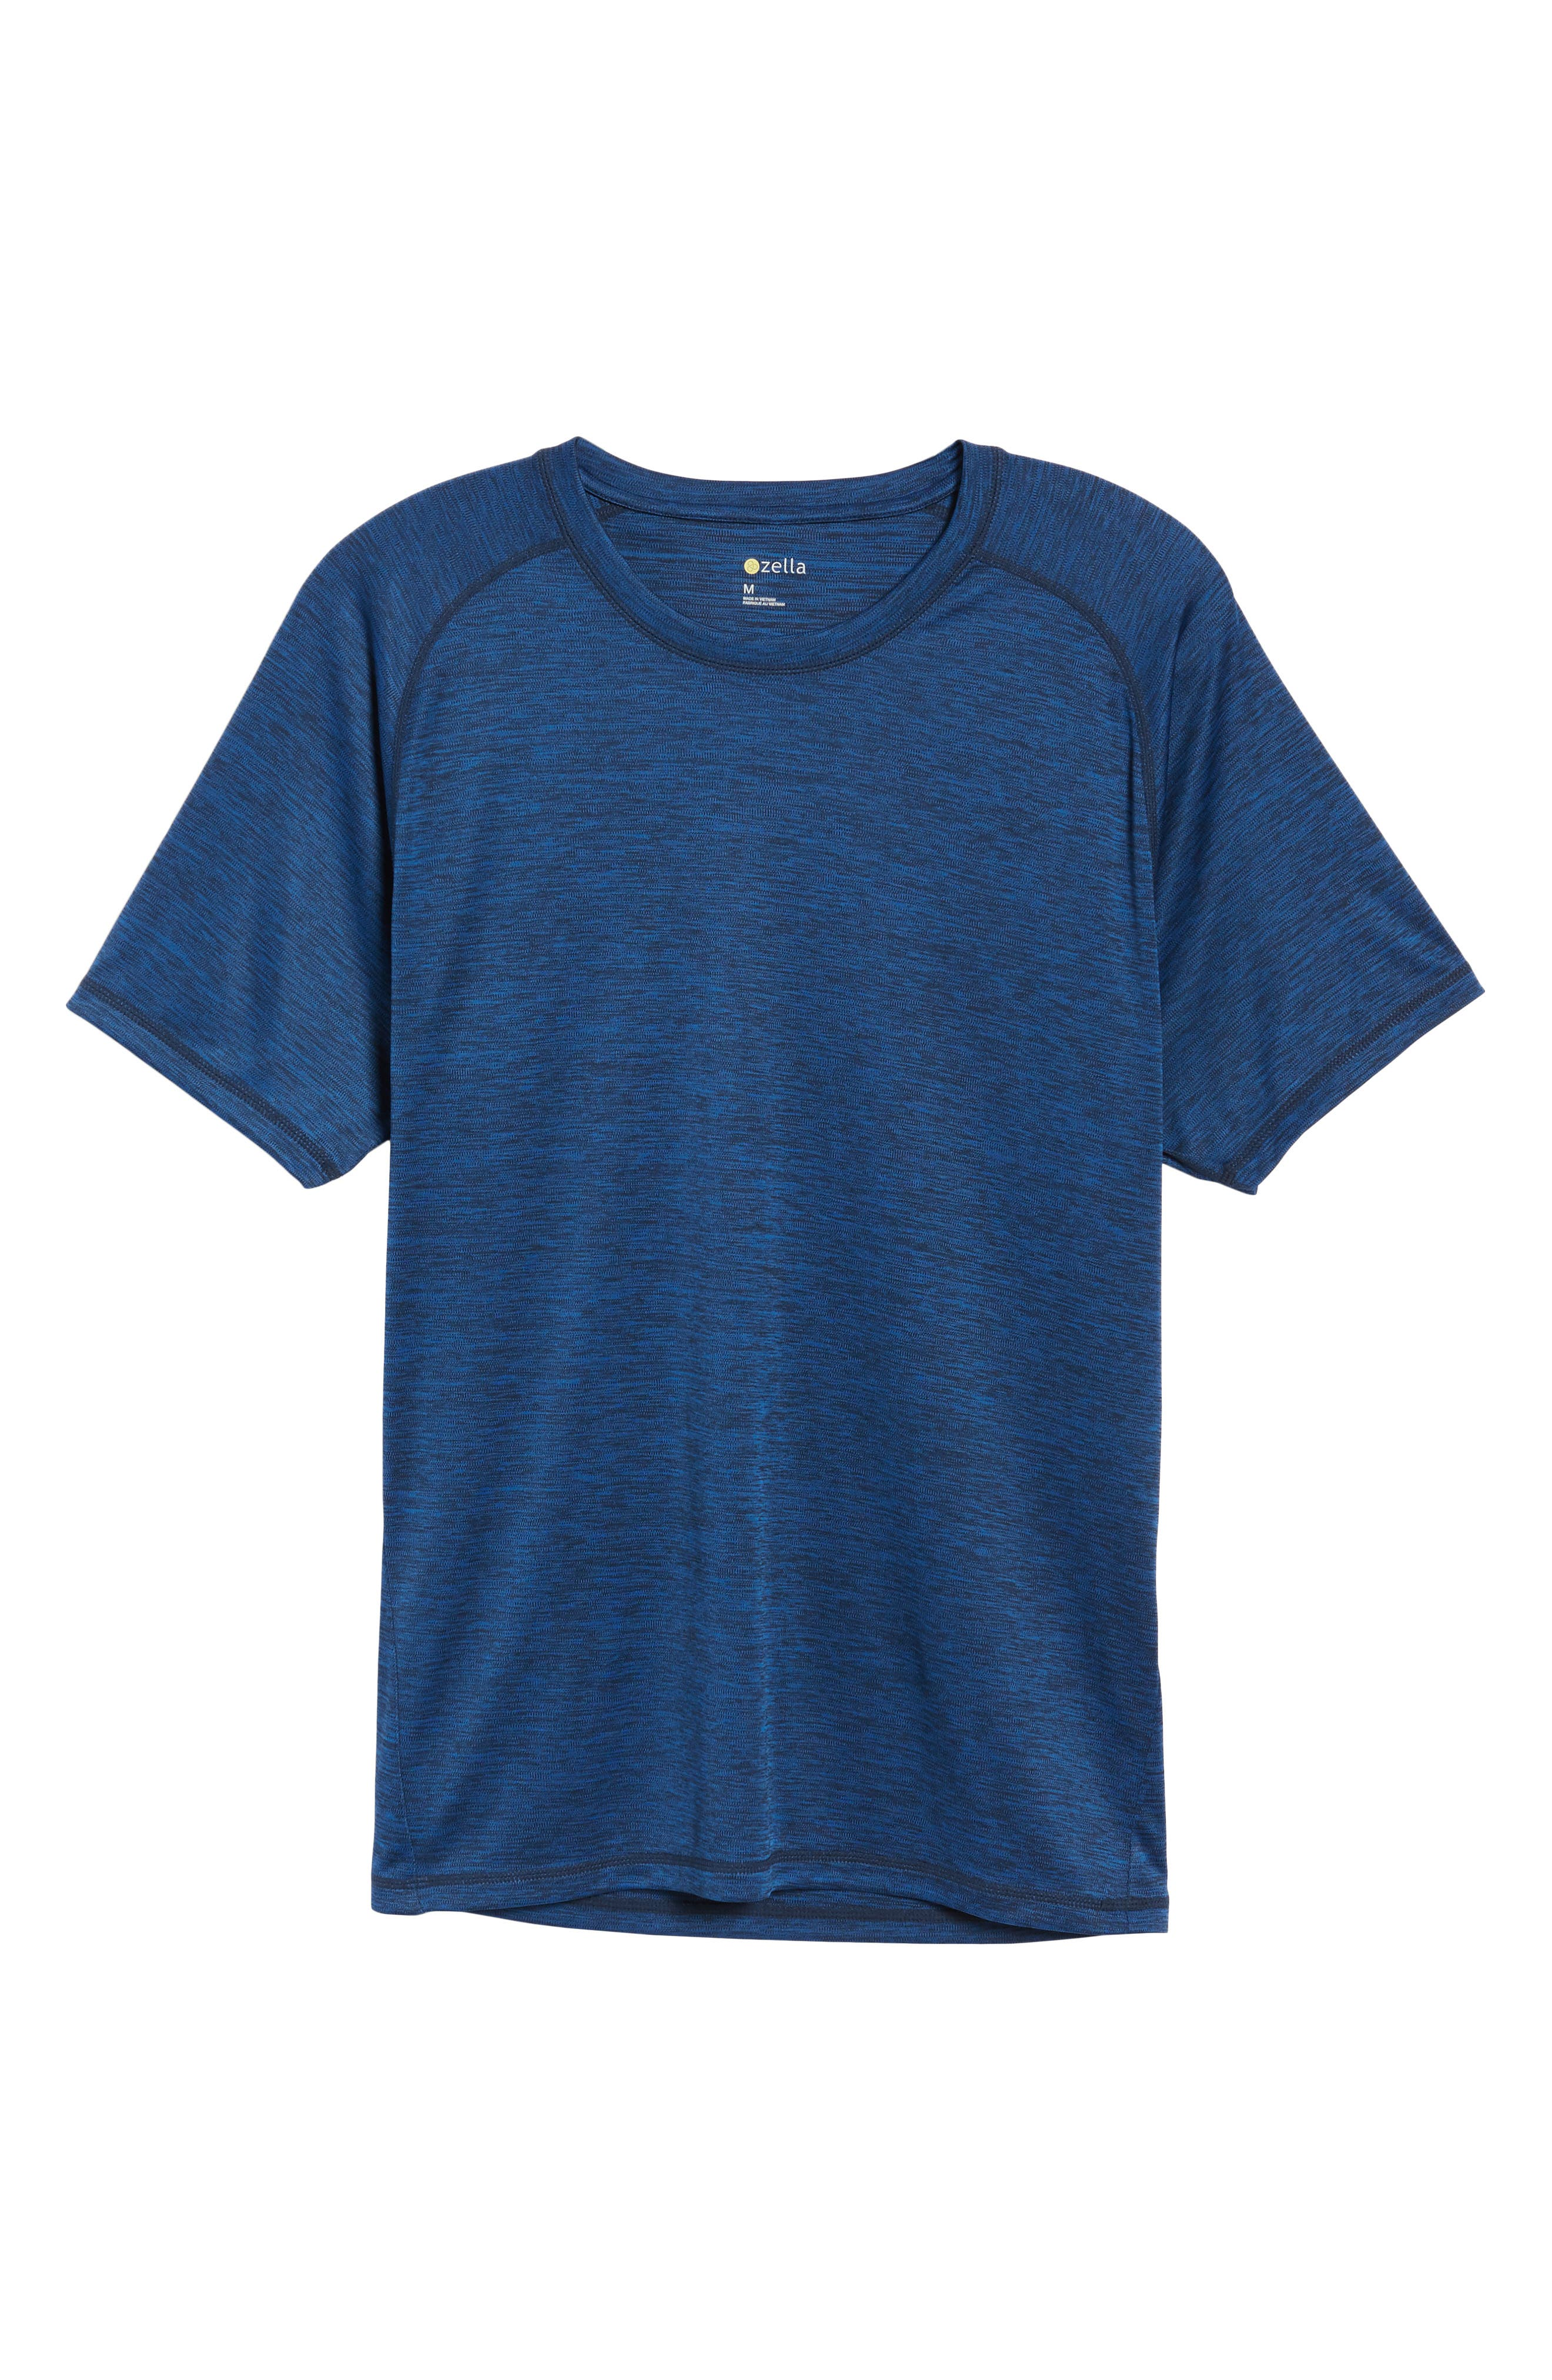 Triplite T-Shirt,                         Main,                         color, Navy Malachite Melange